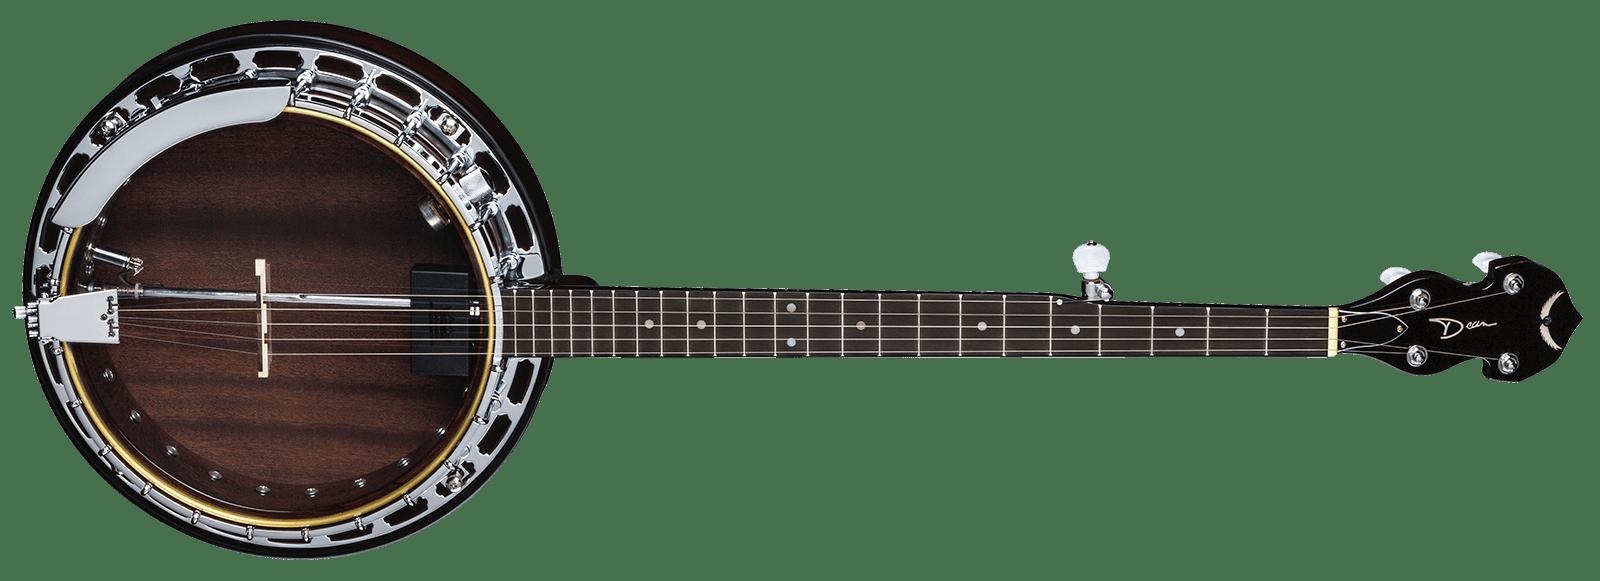 Backwoods 2 Pro Banjo w/Pickup